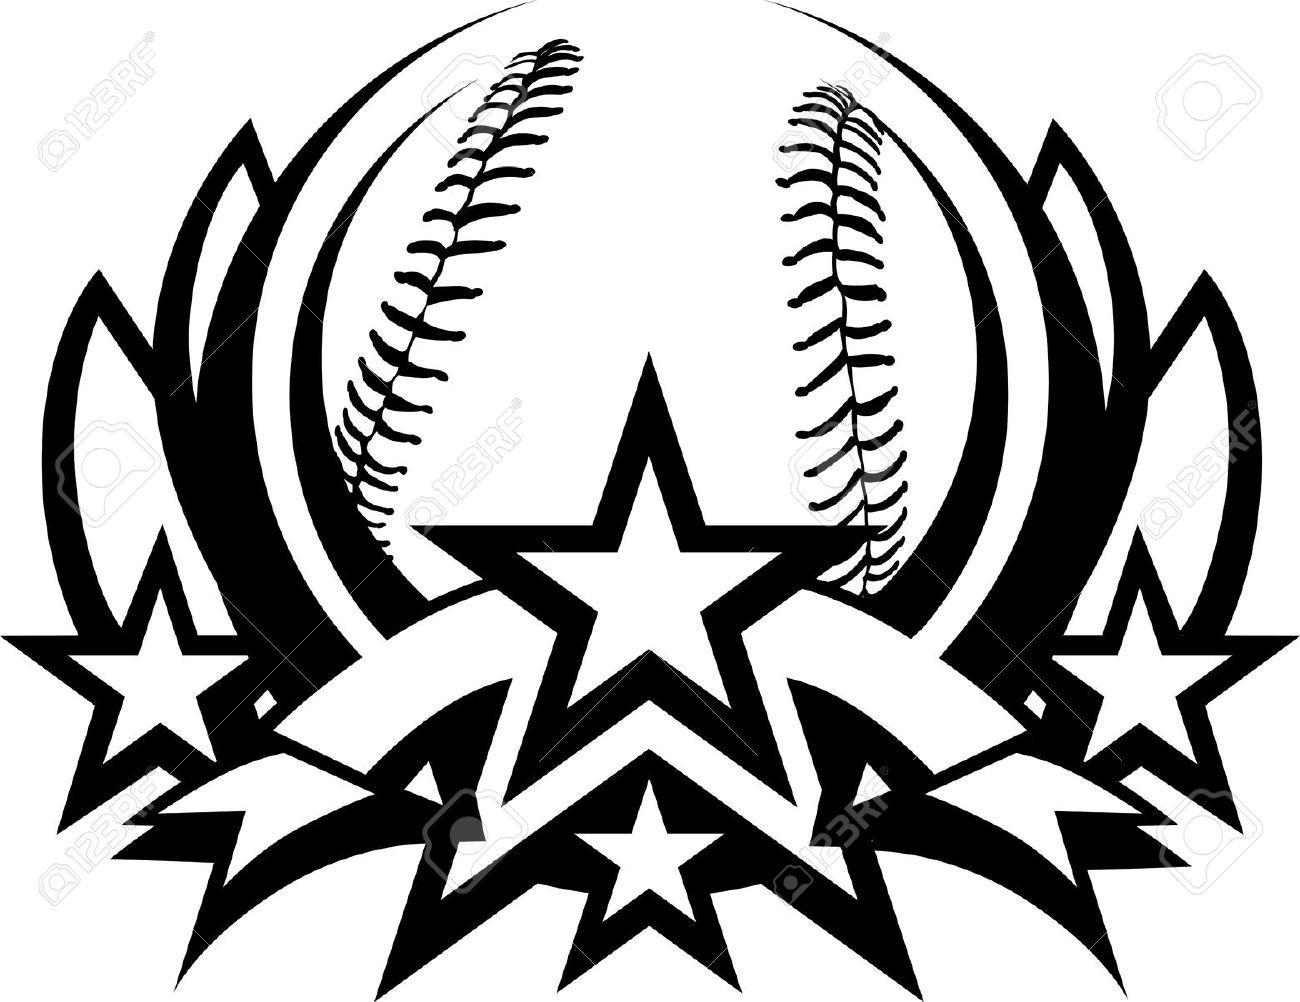 Black and white clipart of all star baseball logos